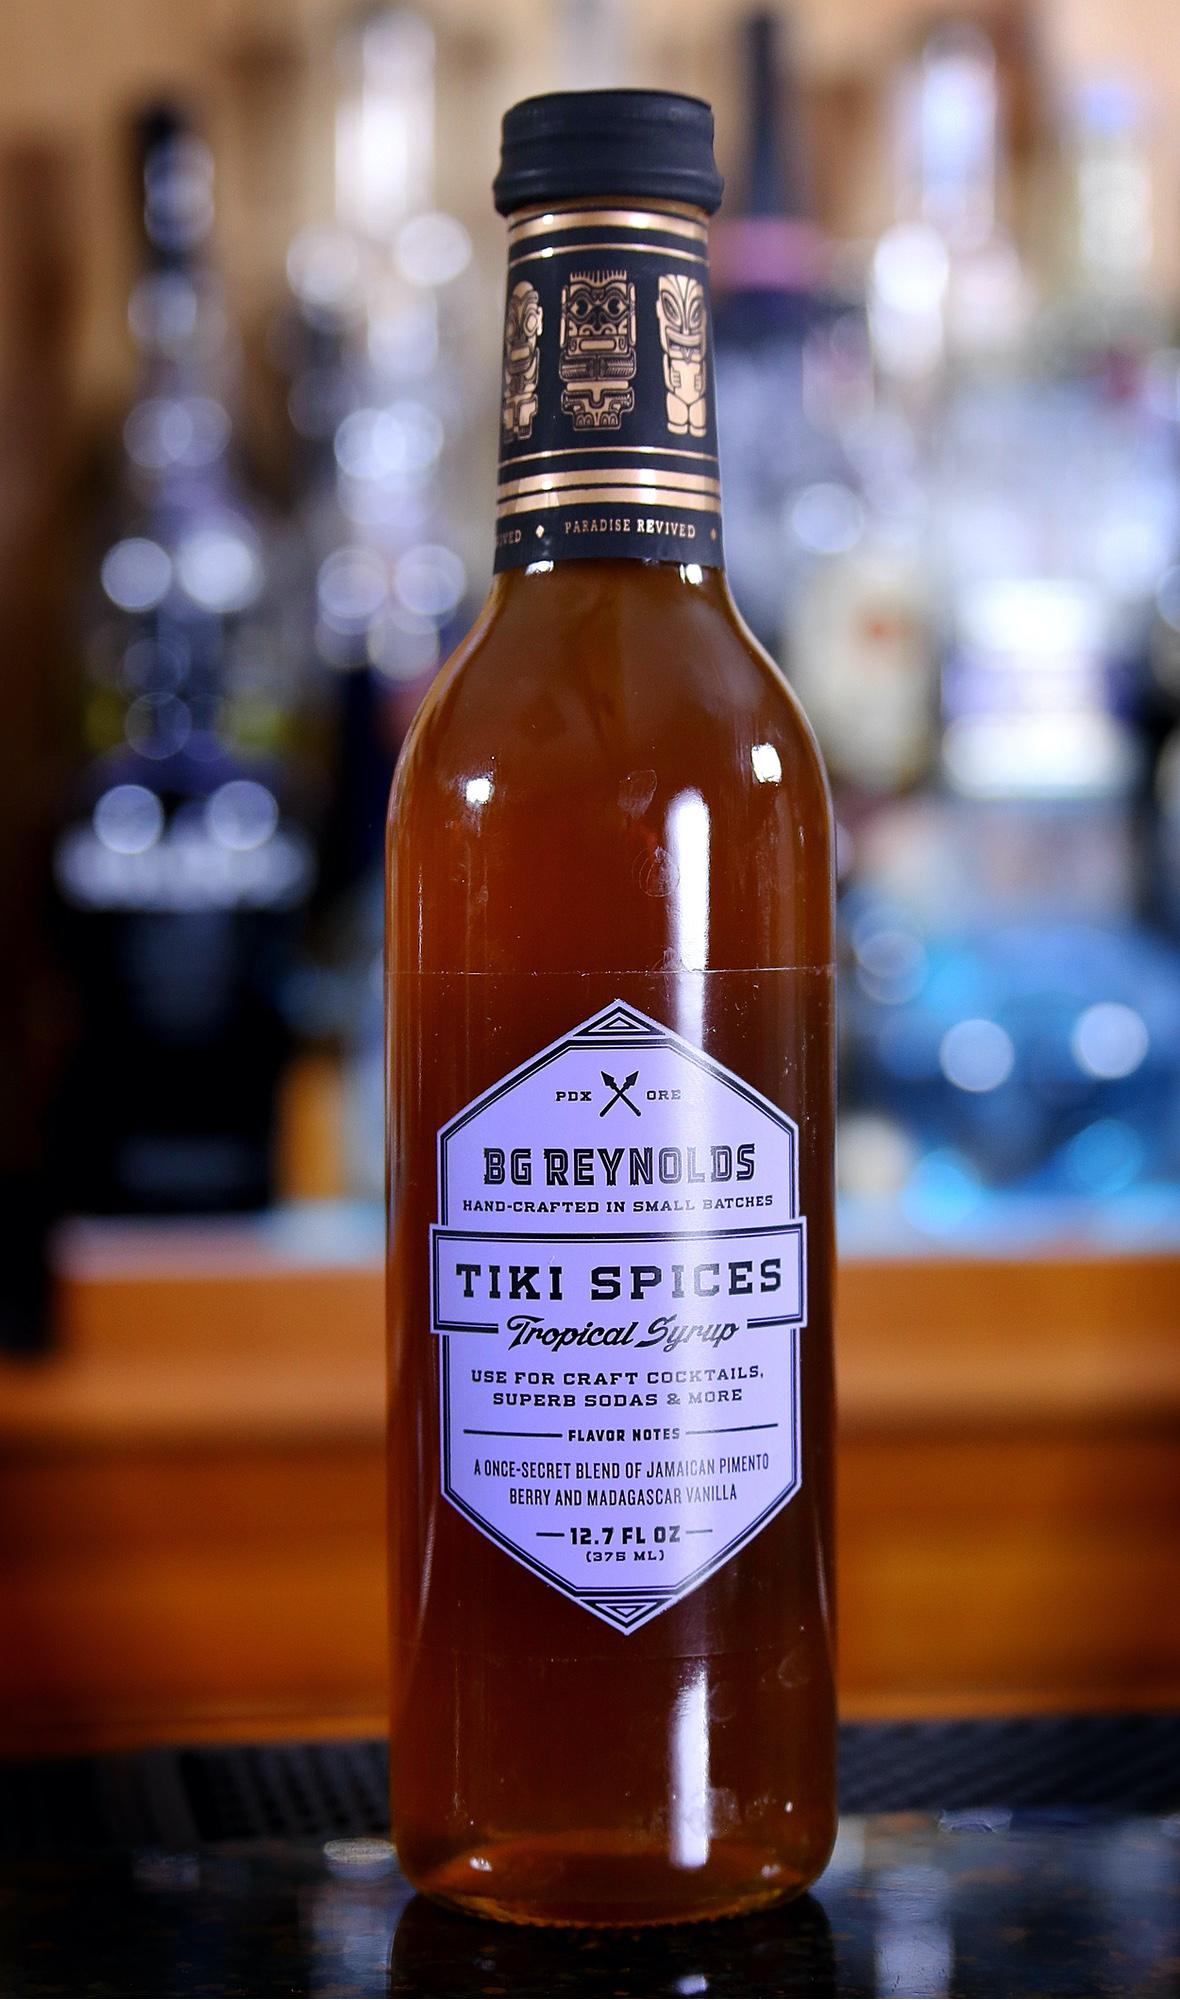 B.G. Reynolds Tiki Spices